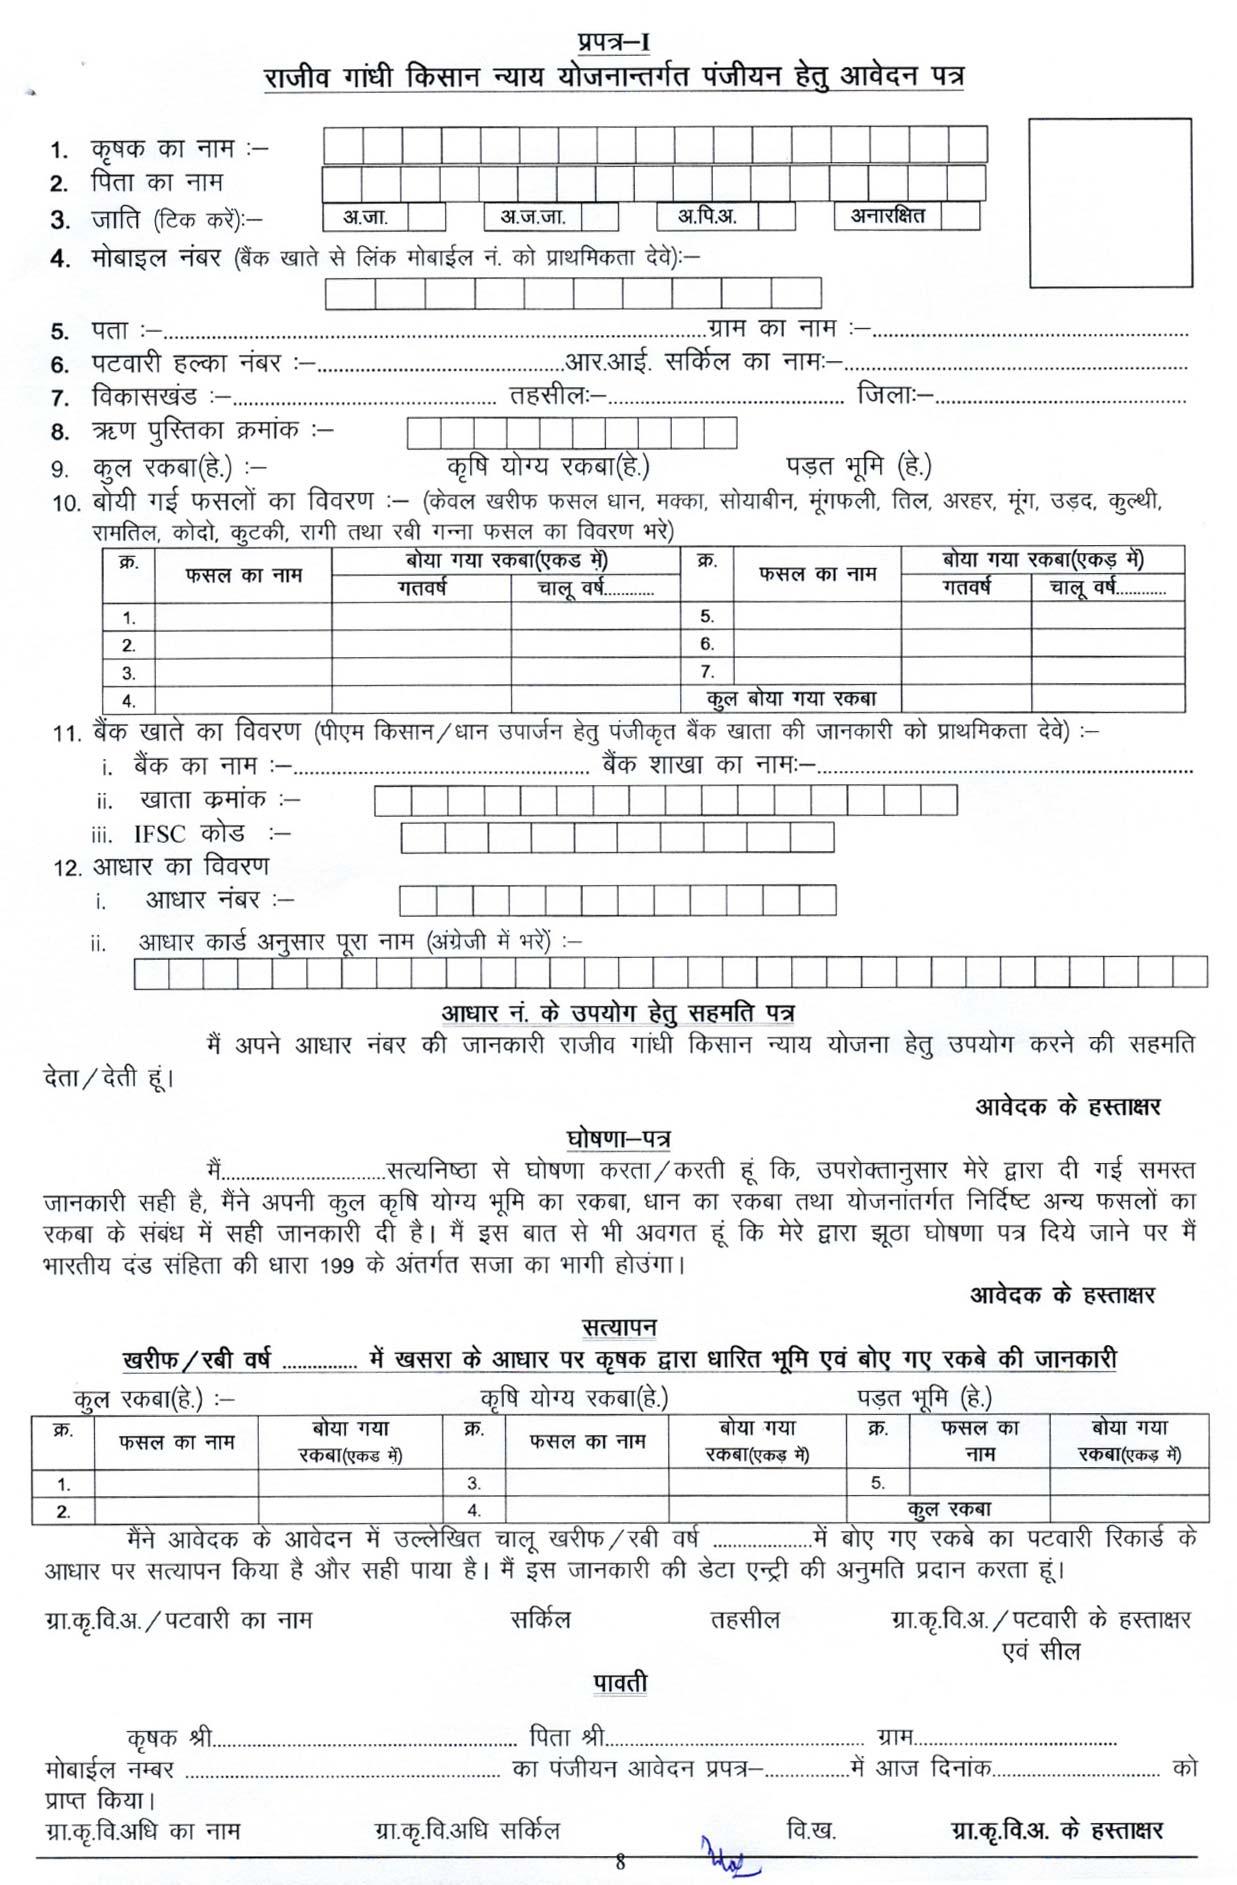 Rajiv Gandhi Kisan Nyay Yojana Application / Registration Form